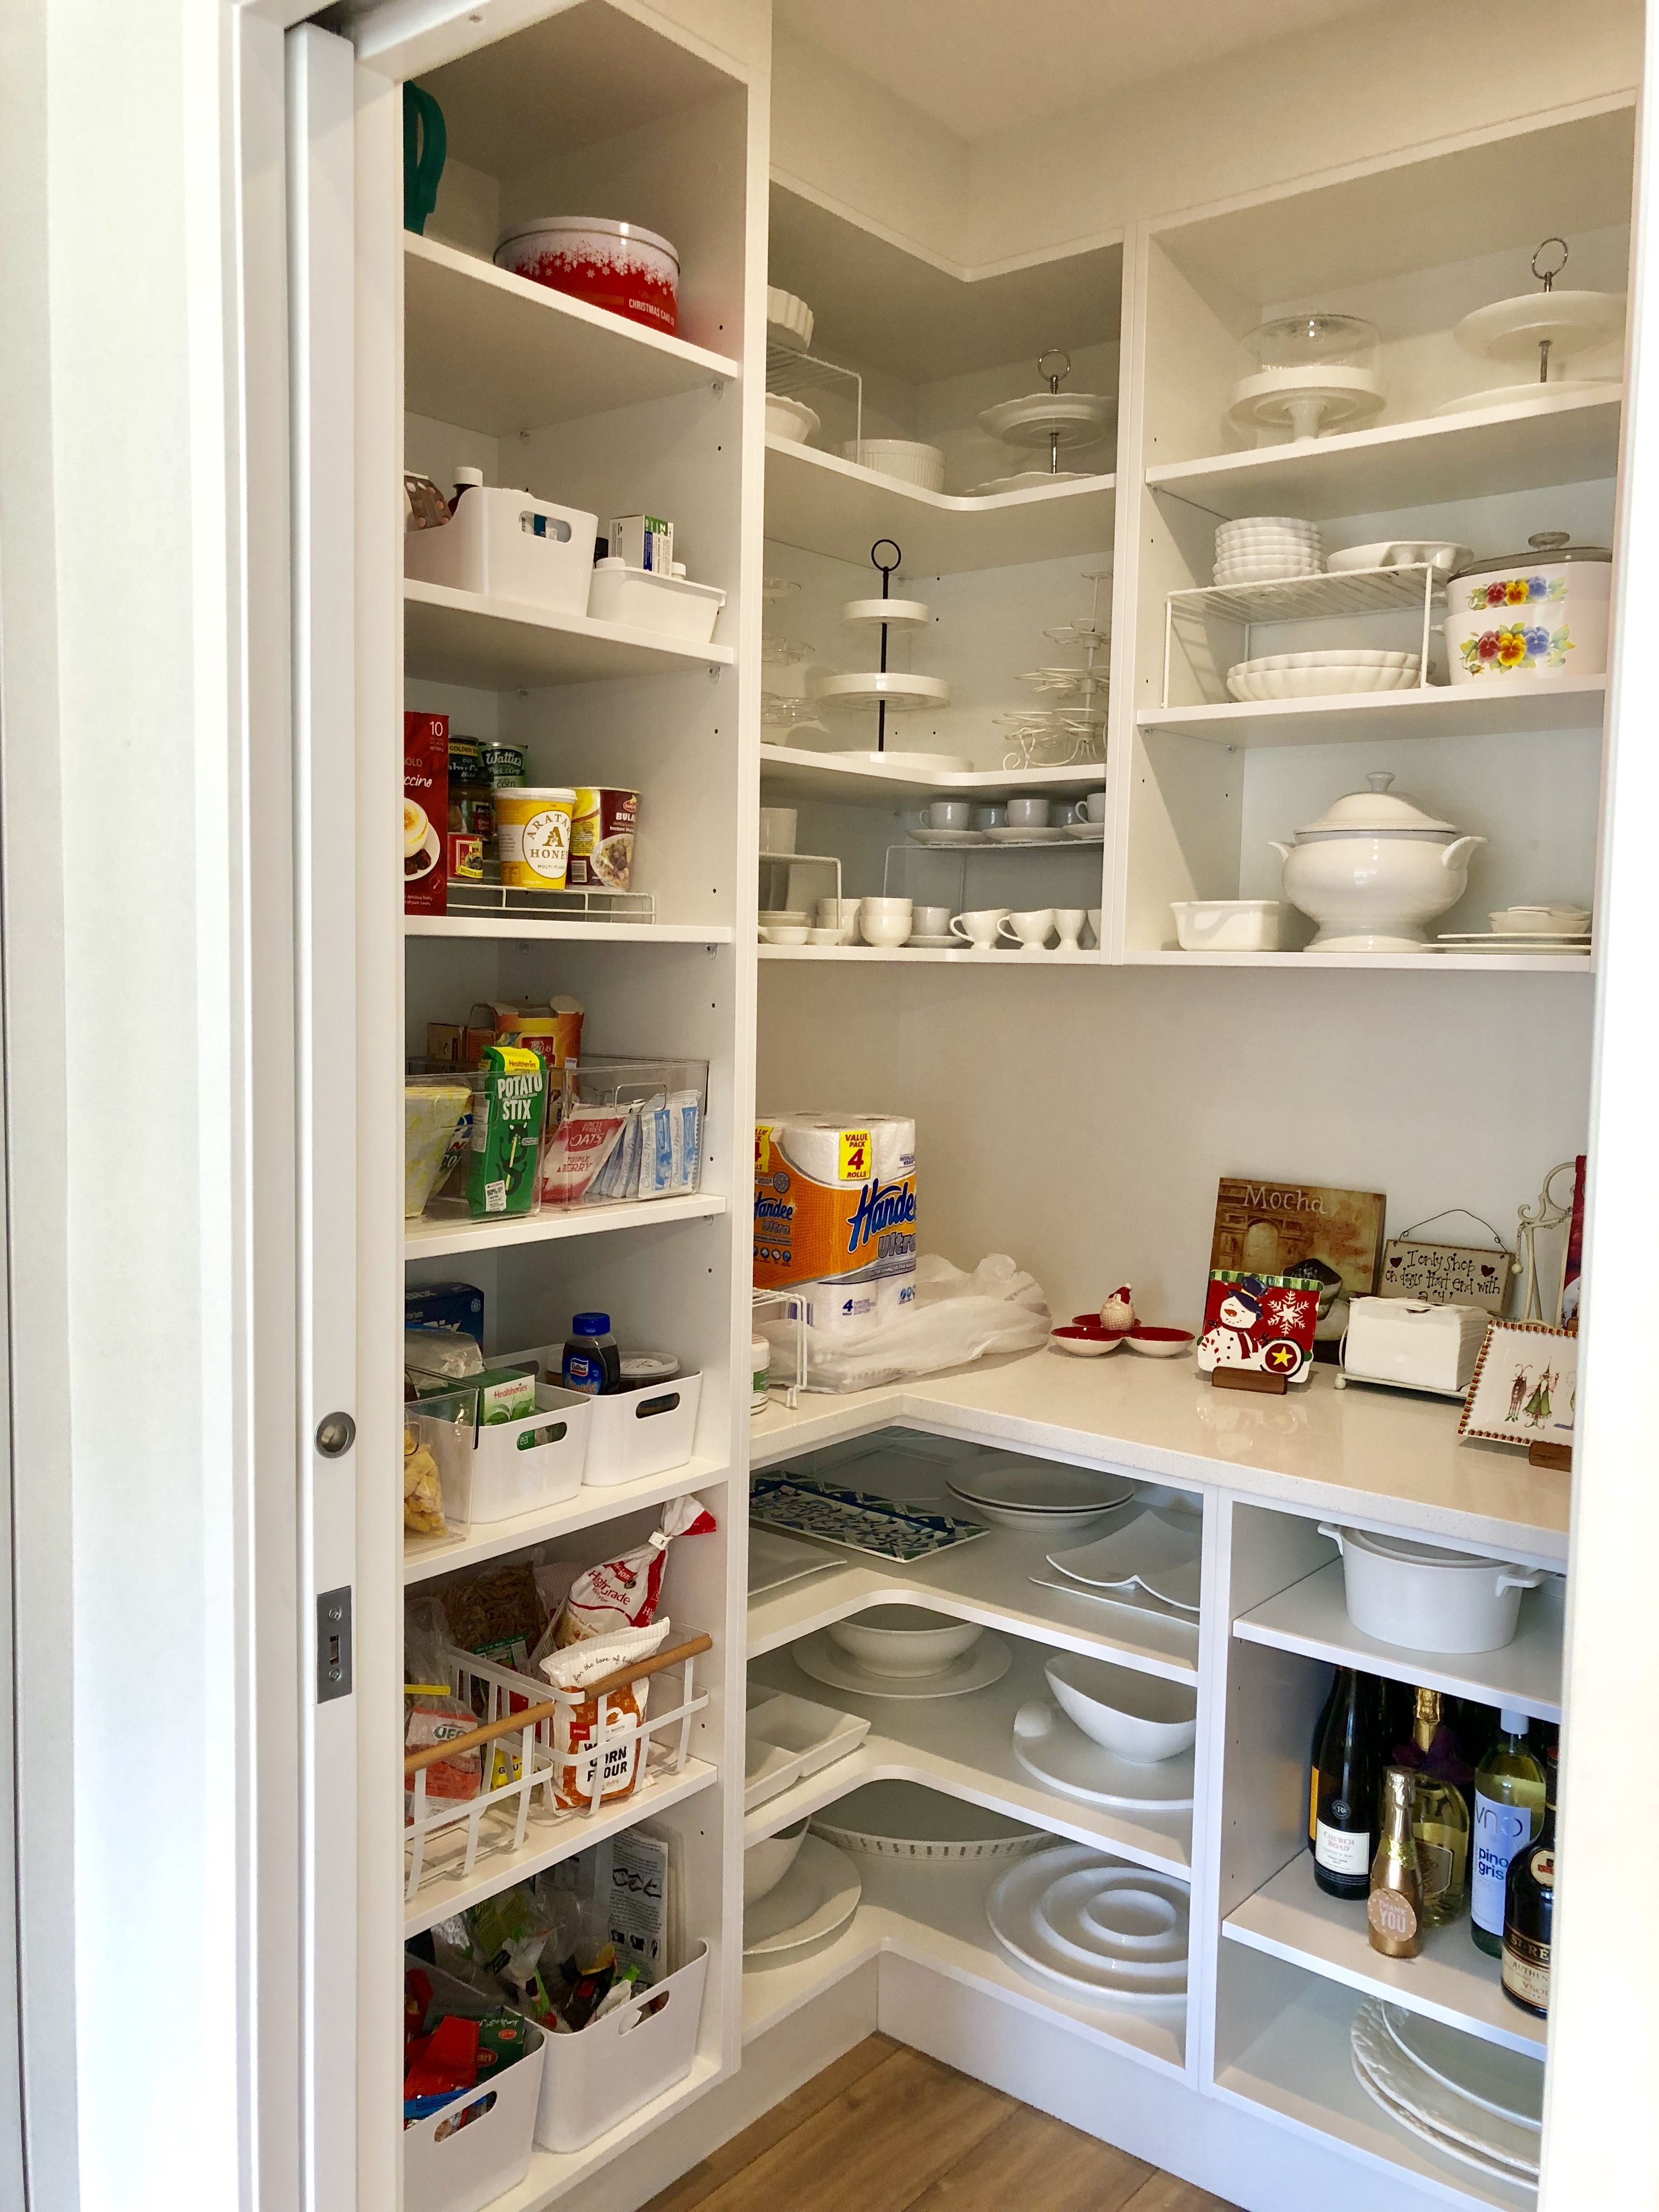 9x9 Room Design: Kitchen Pantry Design, Pantry Design